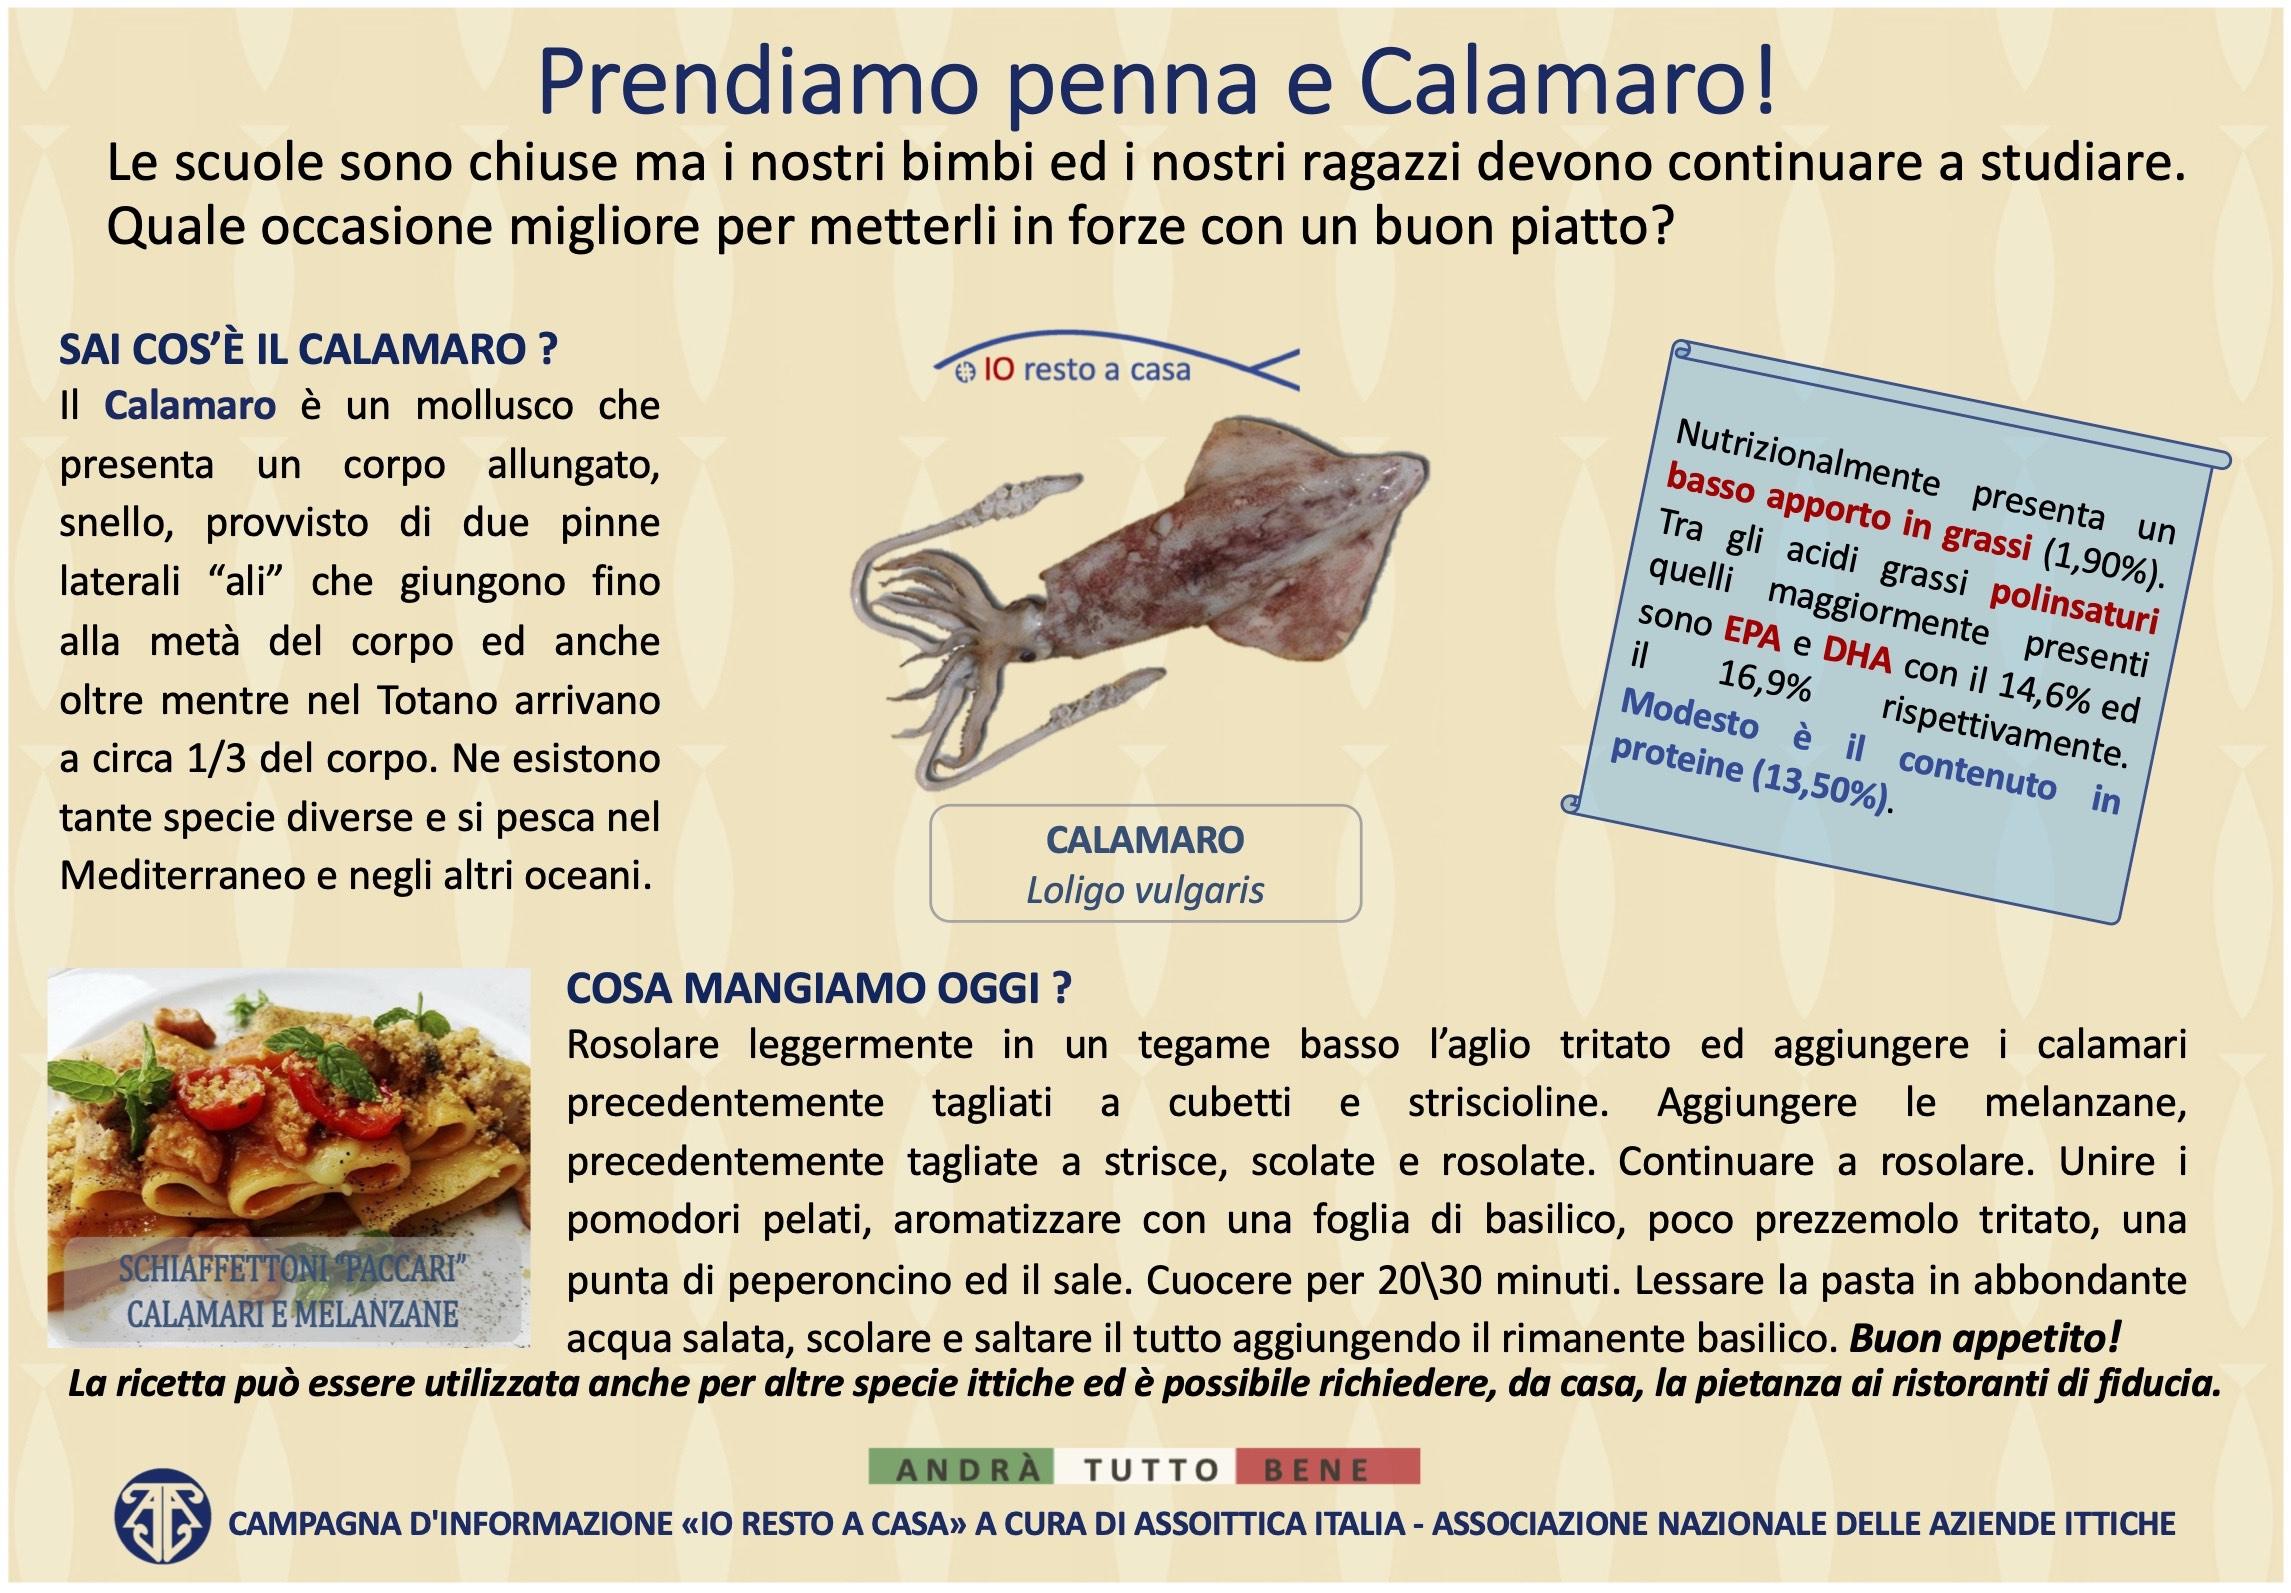 s22 Campagna Assoittica per Coronavirus Calamaro copia 2